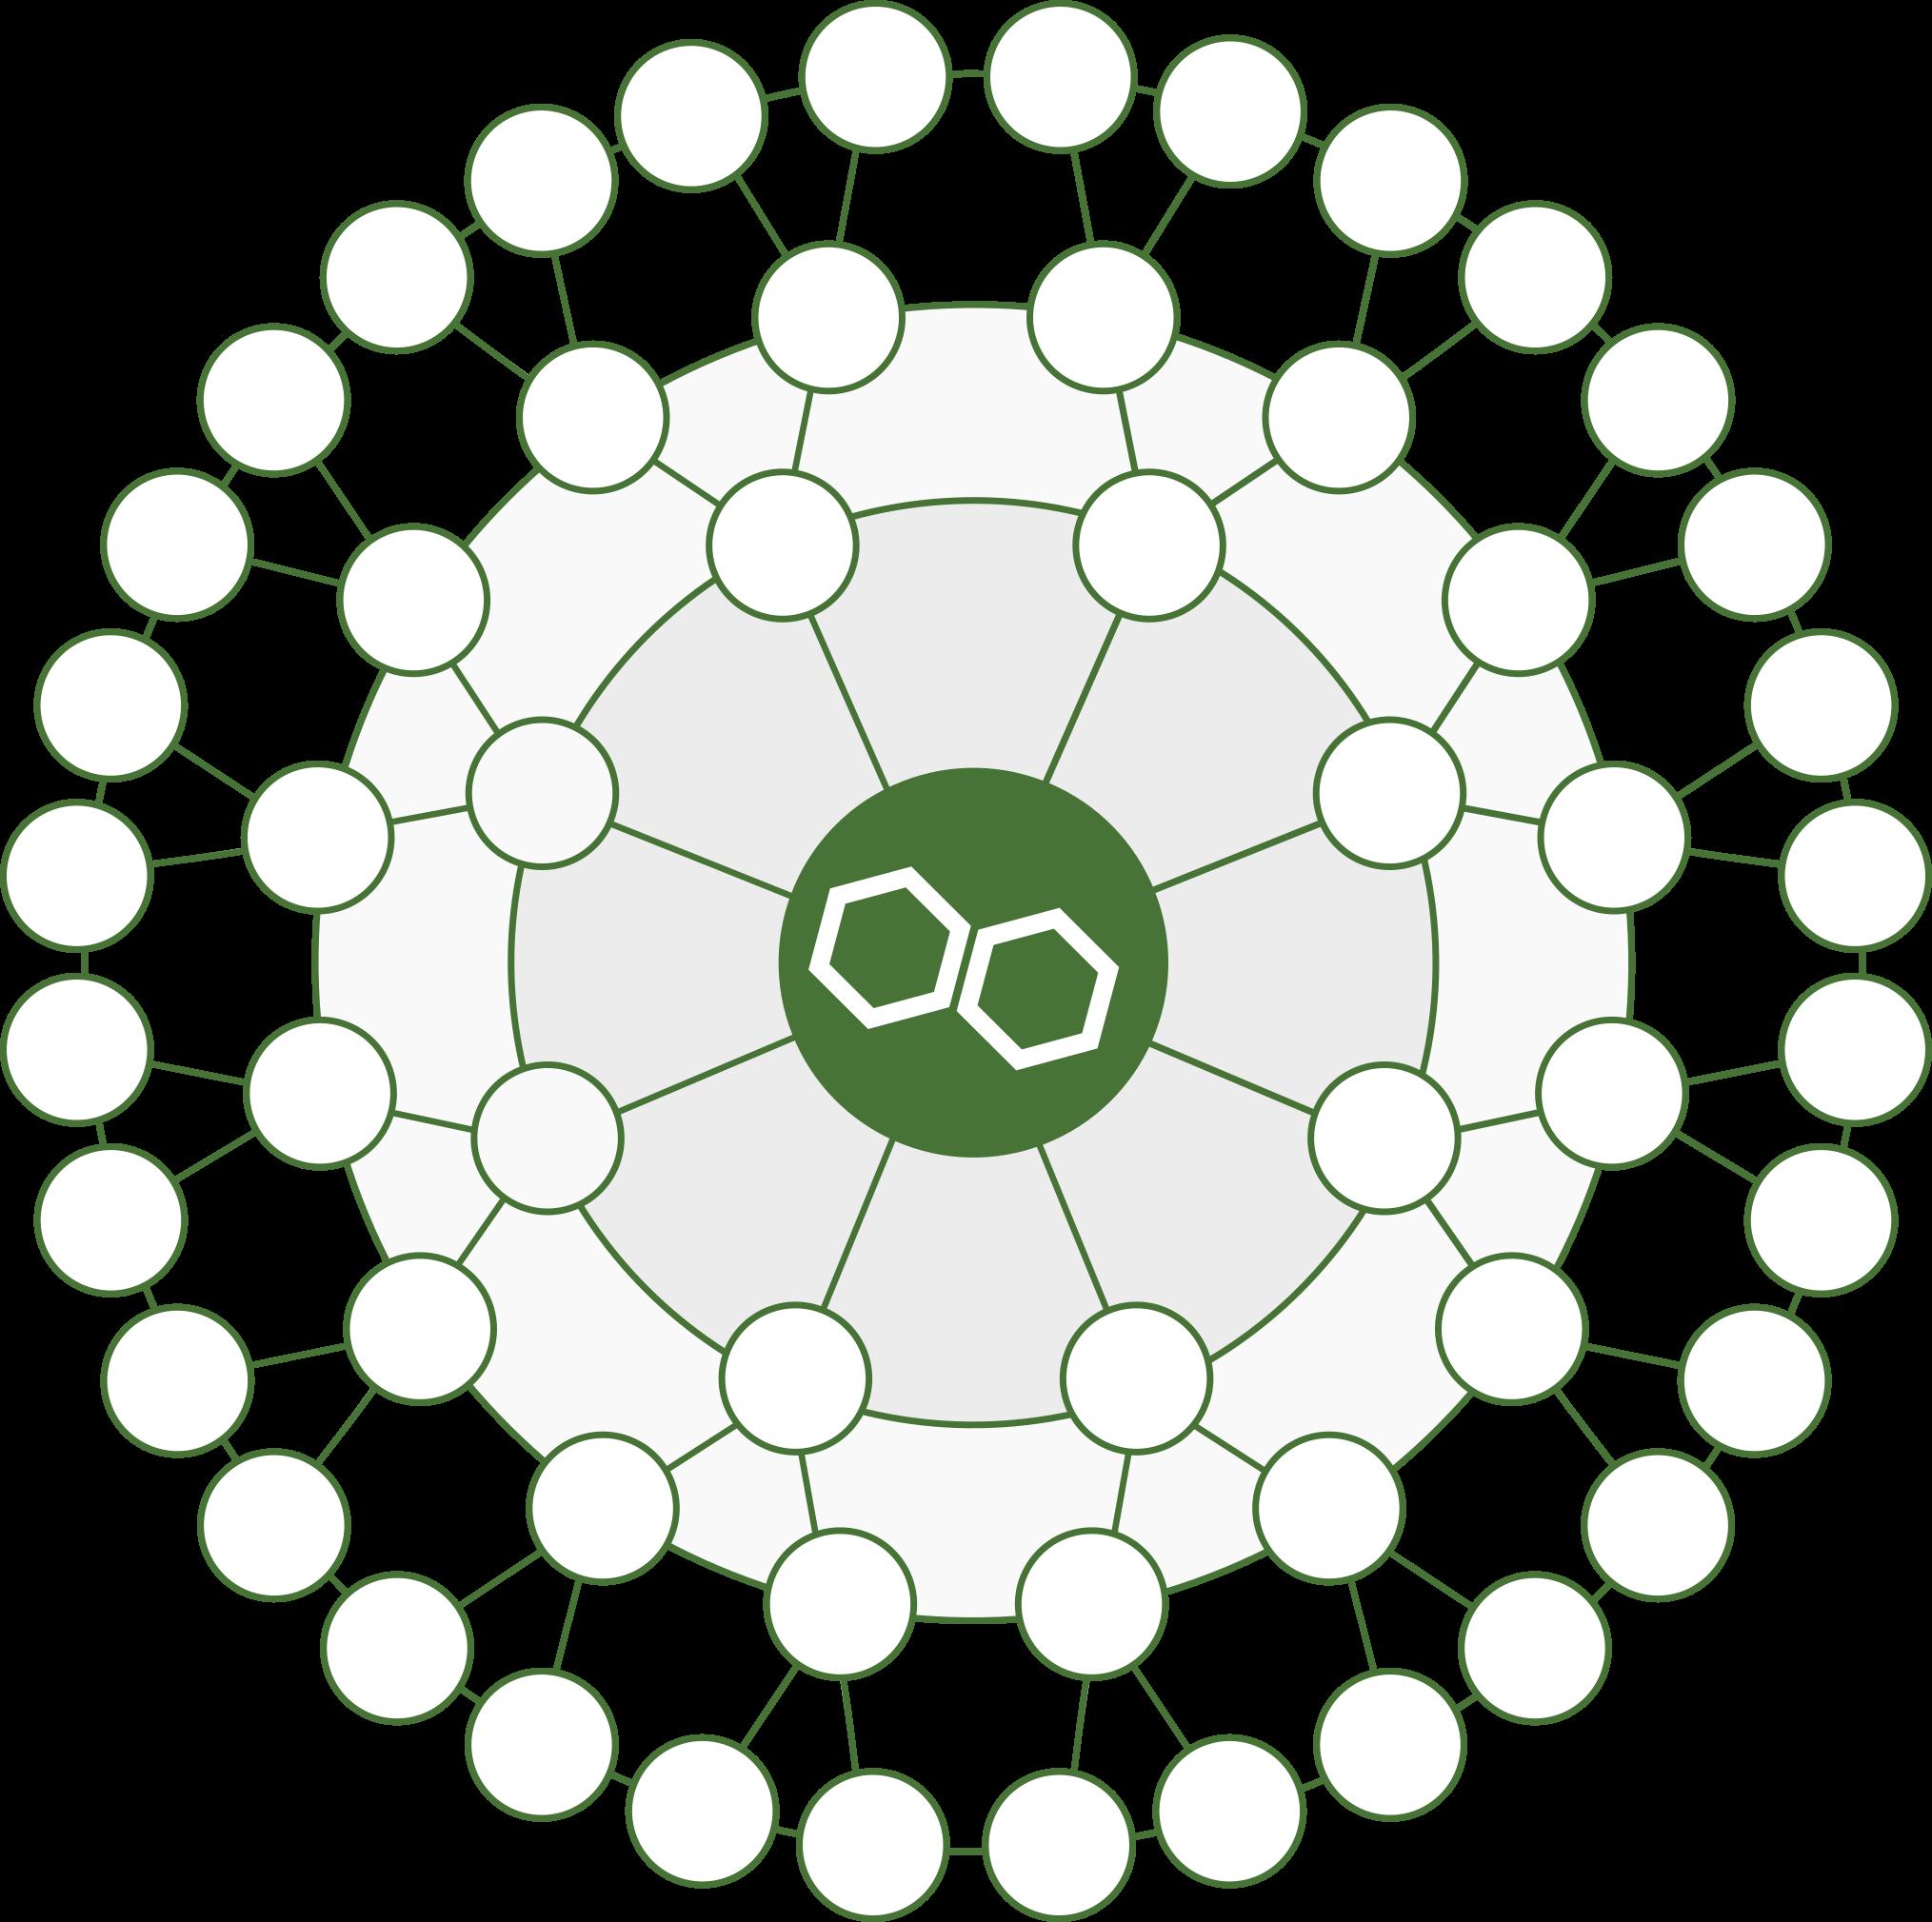 Small Molecules image